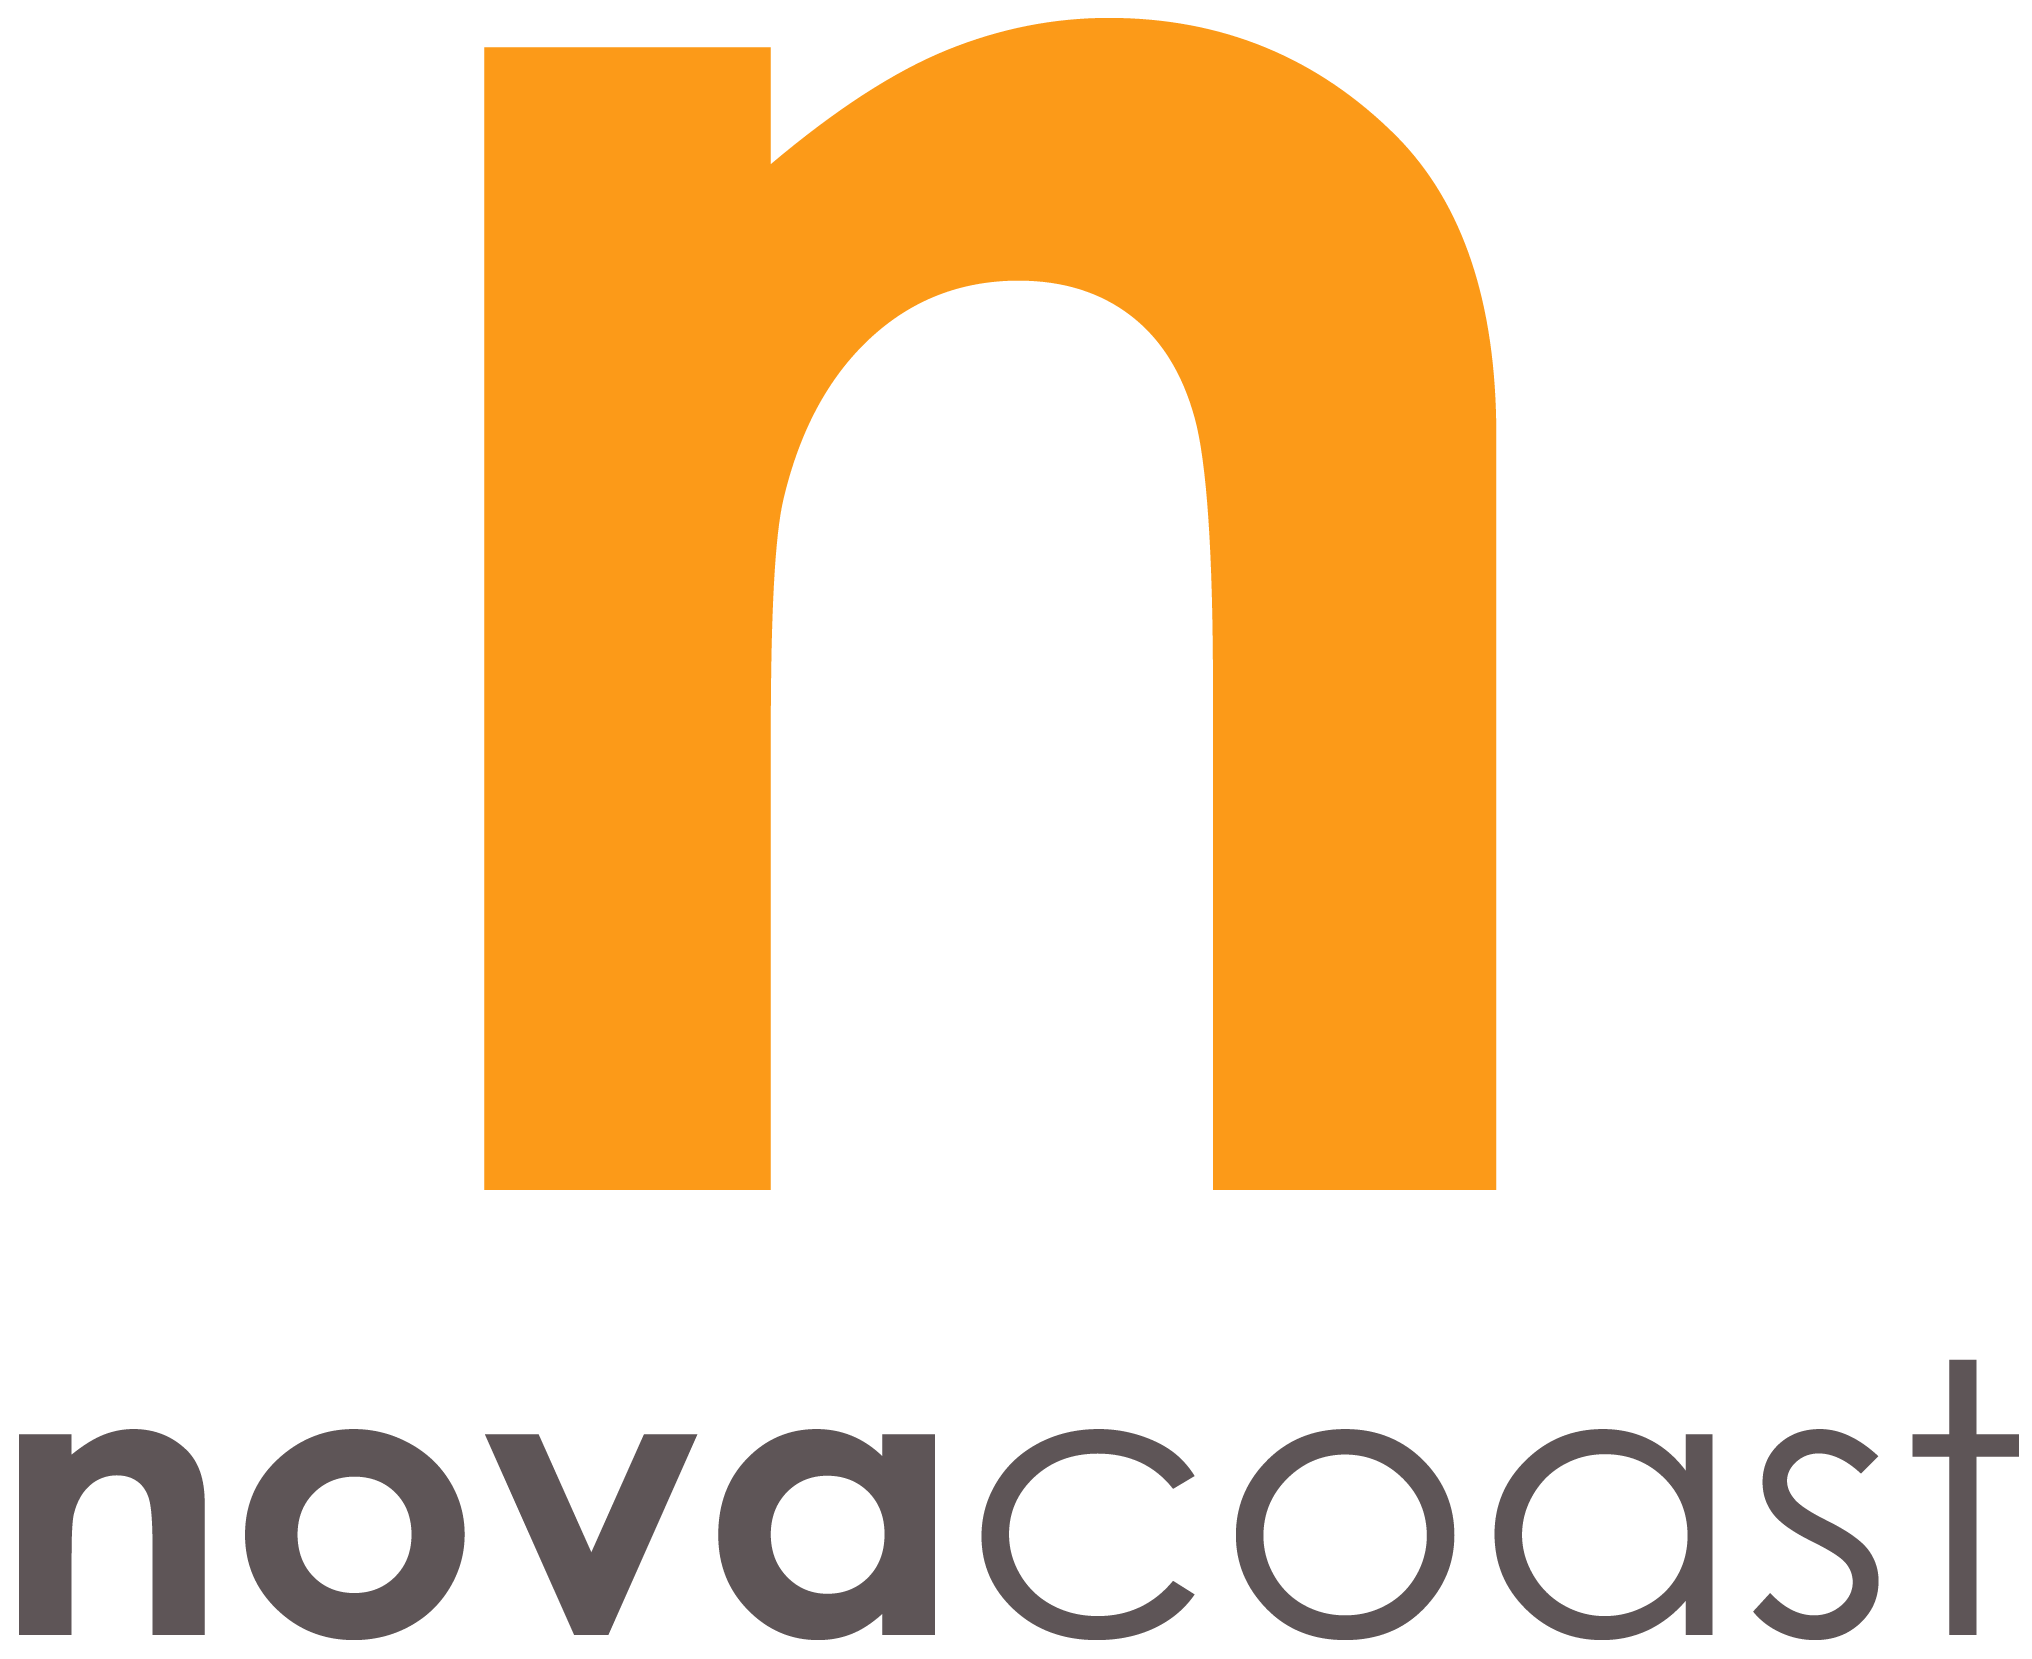 Novacoast Named to MSSP Alert's Top 250 MSSPs List for 2020